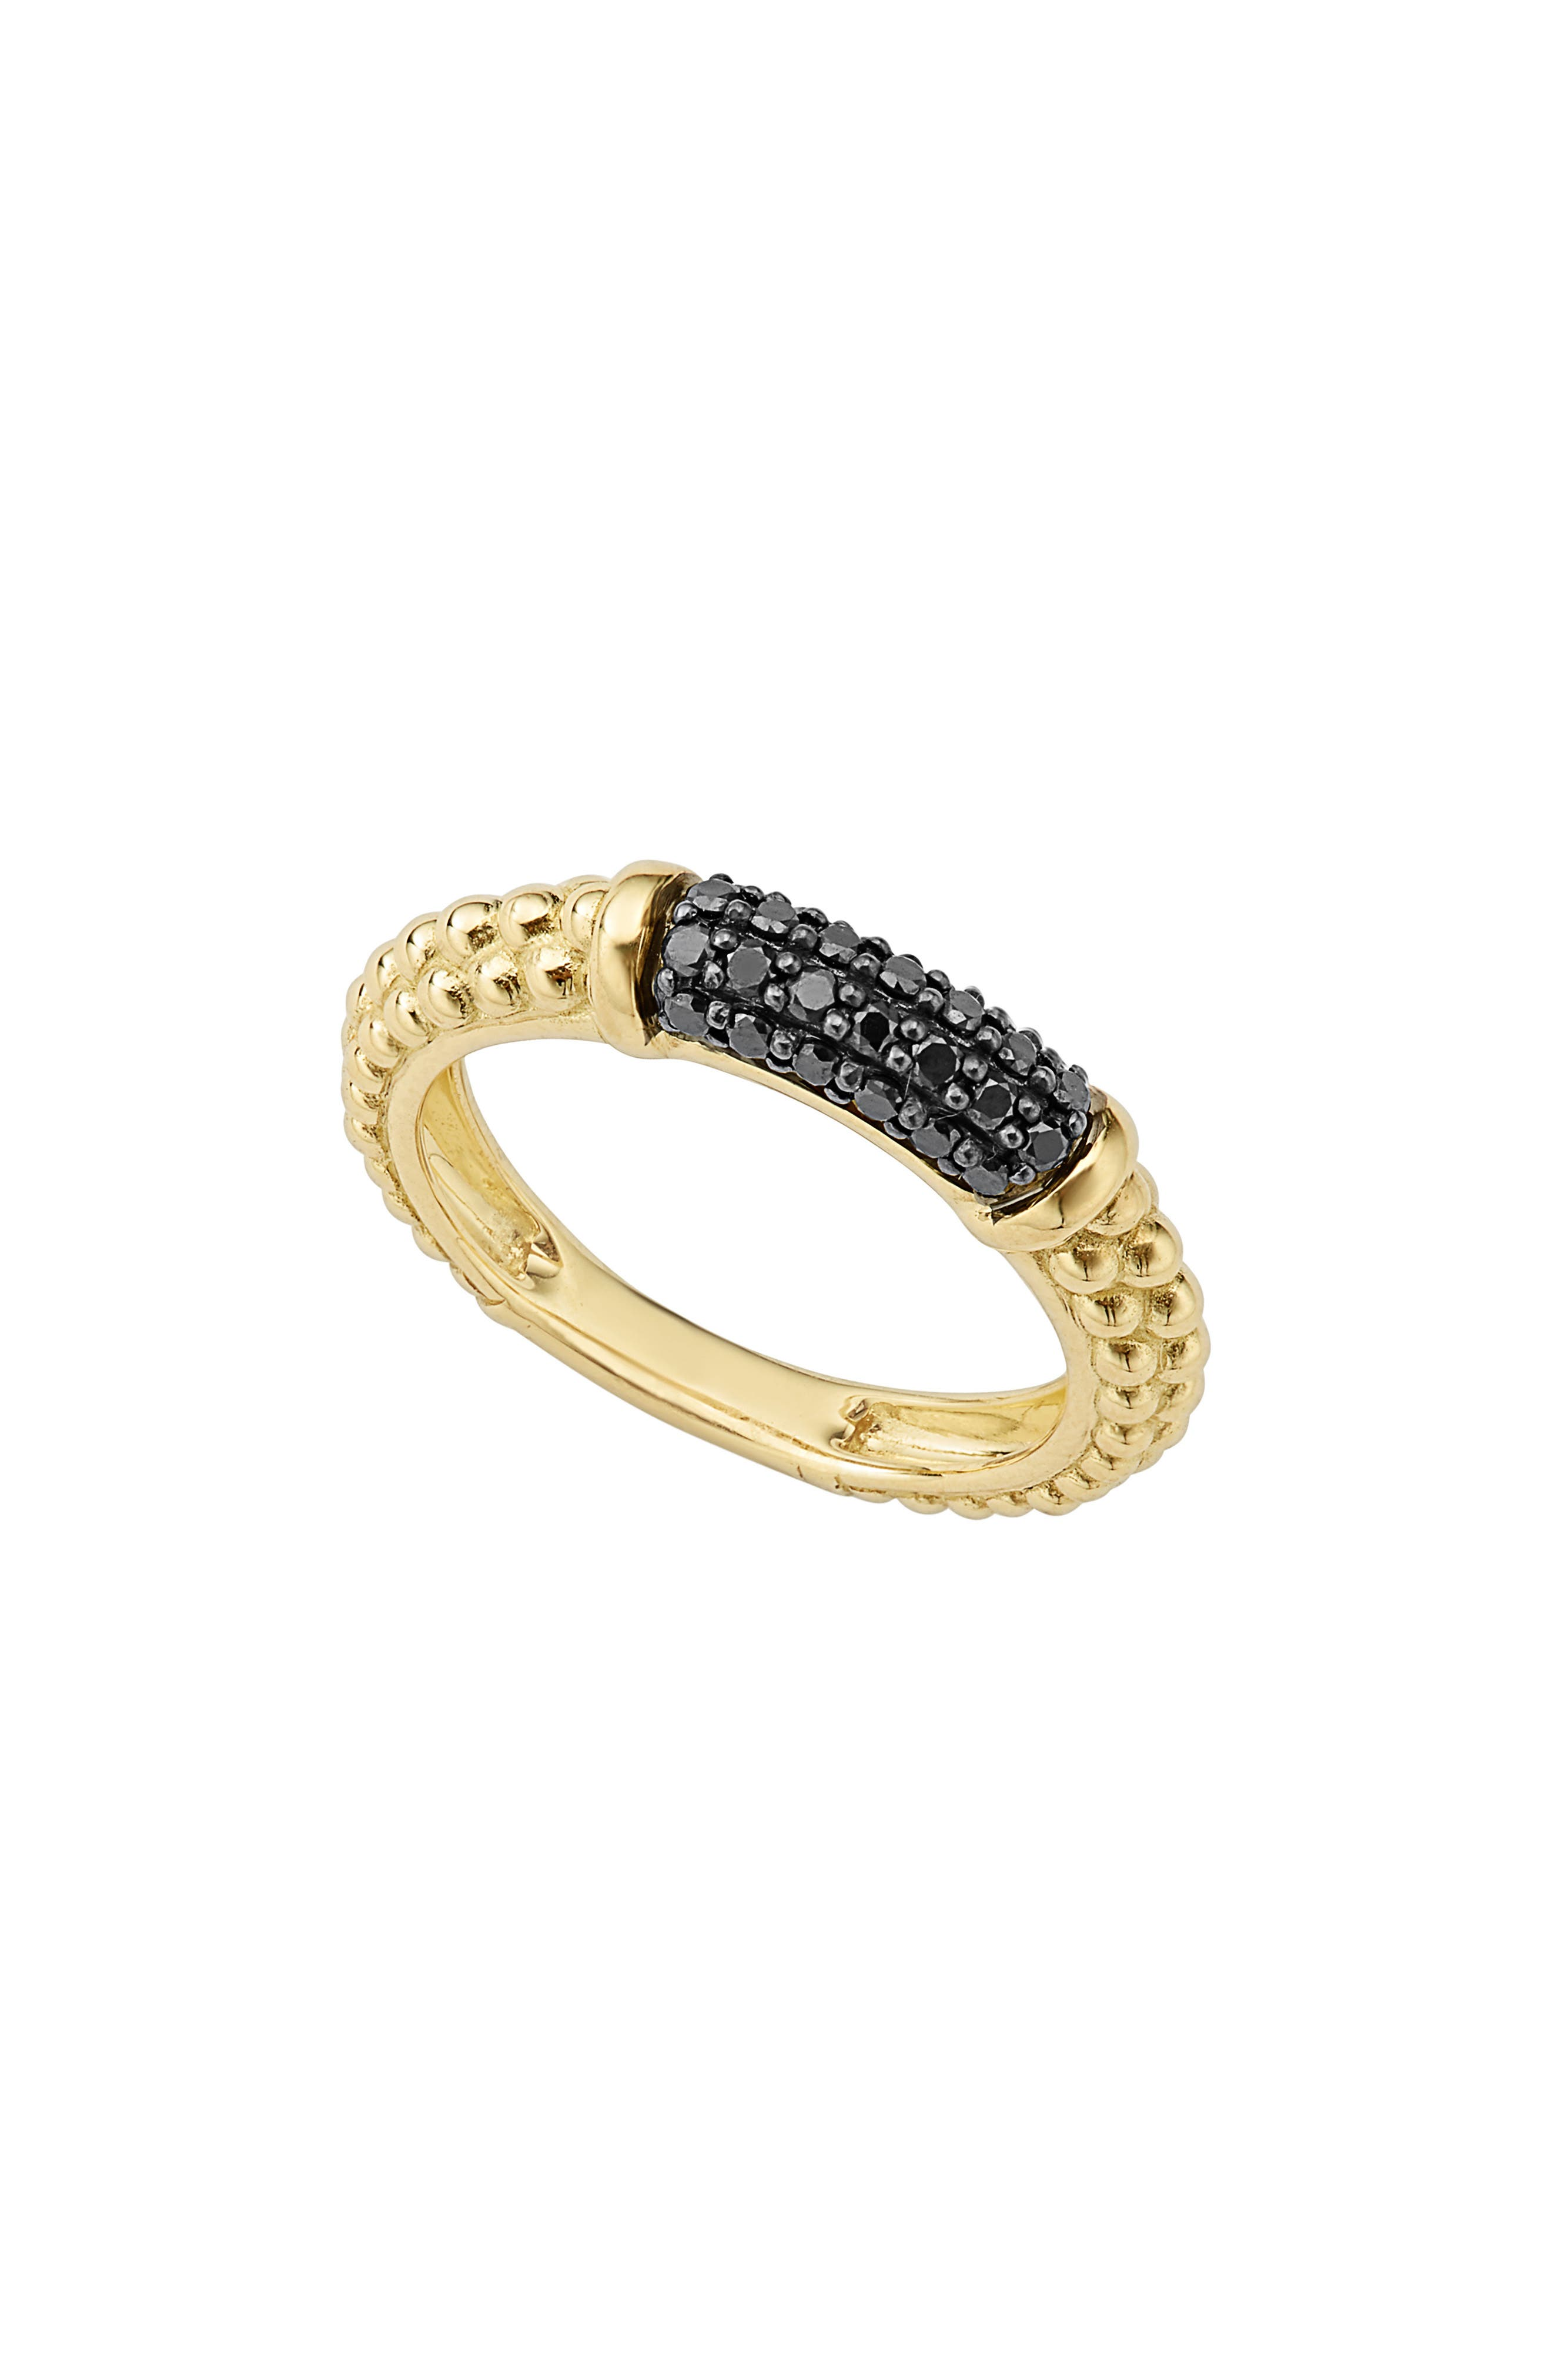 Gold & Black Caviar Black Diamond Pavé Stacking Ring,                             Main thumbnail 1, color,                             GOLD